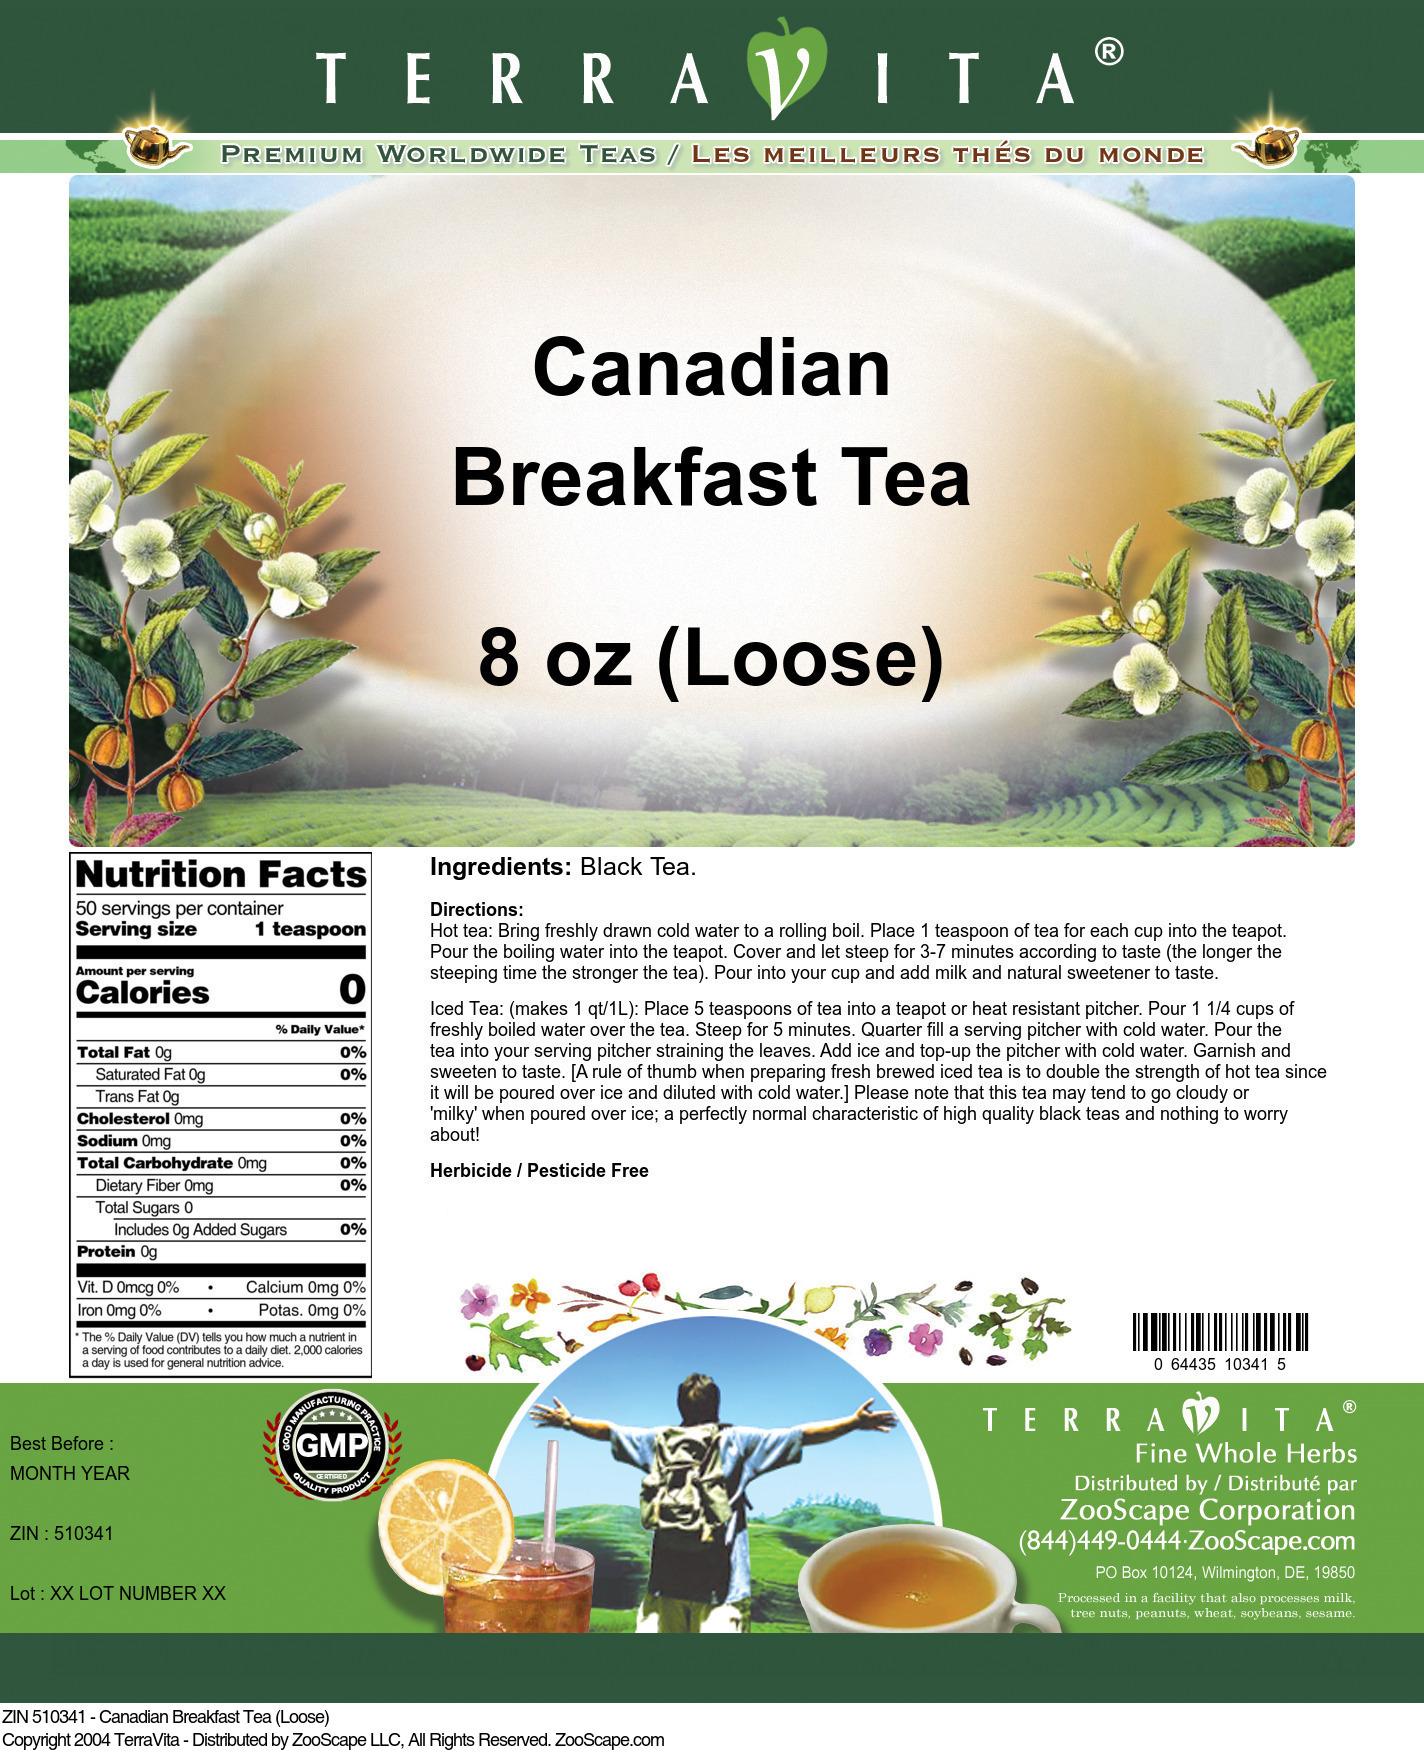 Canadian Breakfast Tea (Loose)